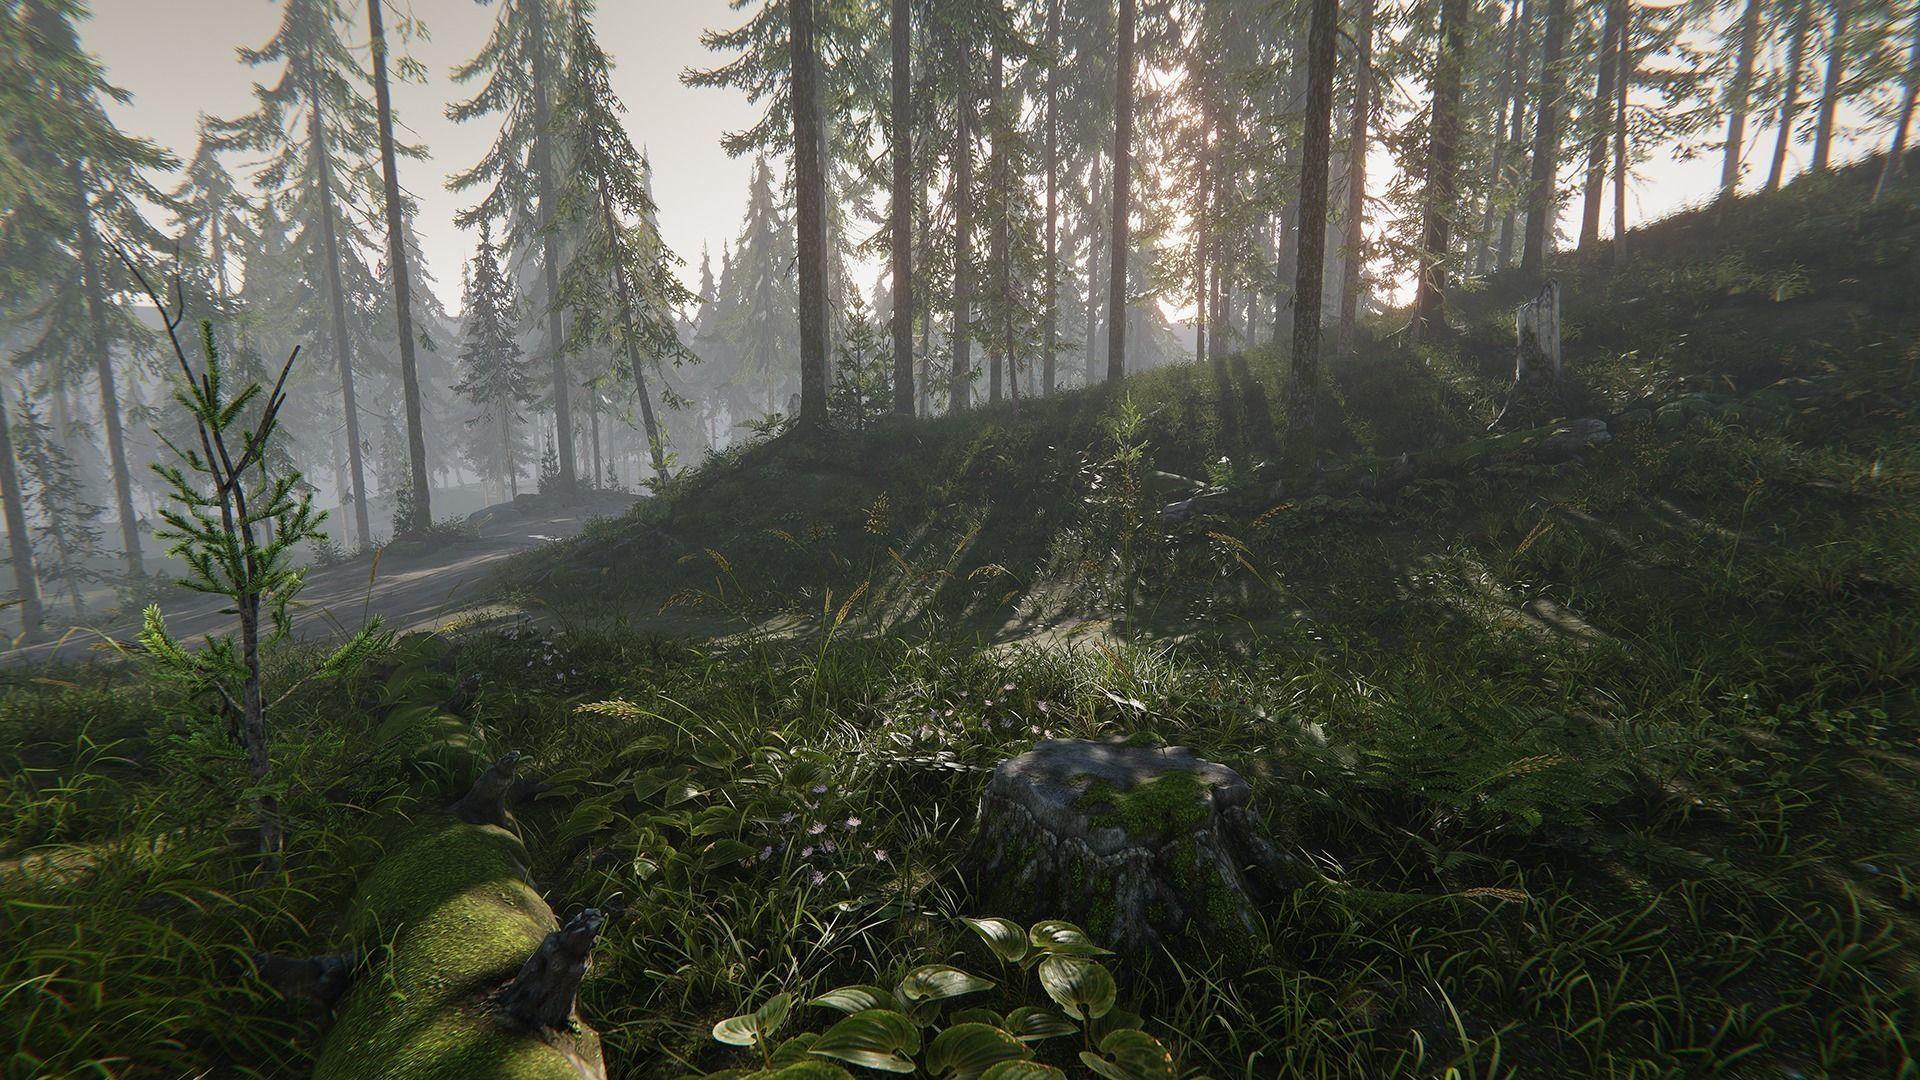 Hazy Hills - Conifer Forest Environment